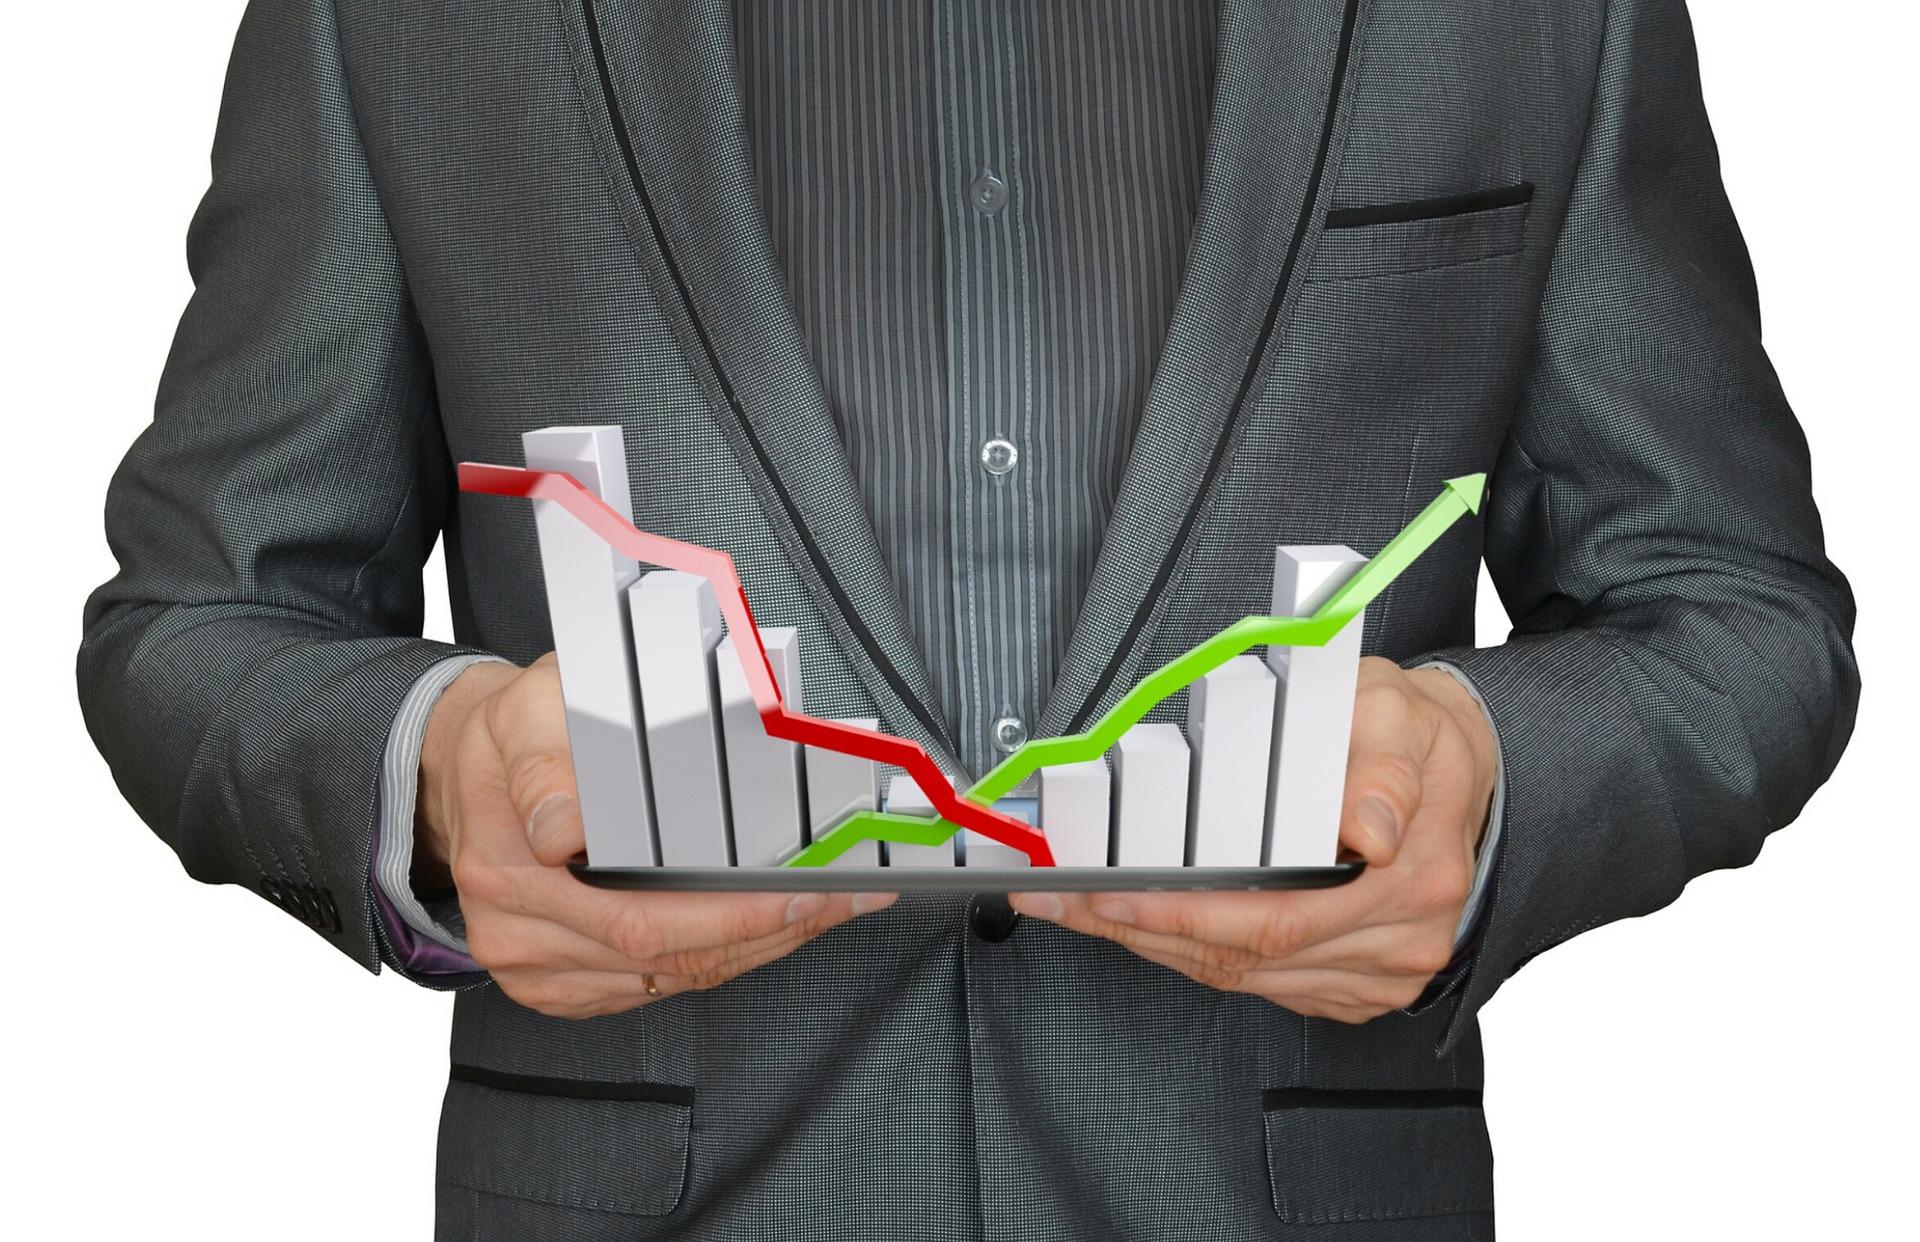 Top financial advisory firms